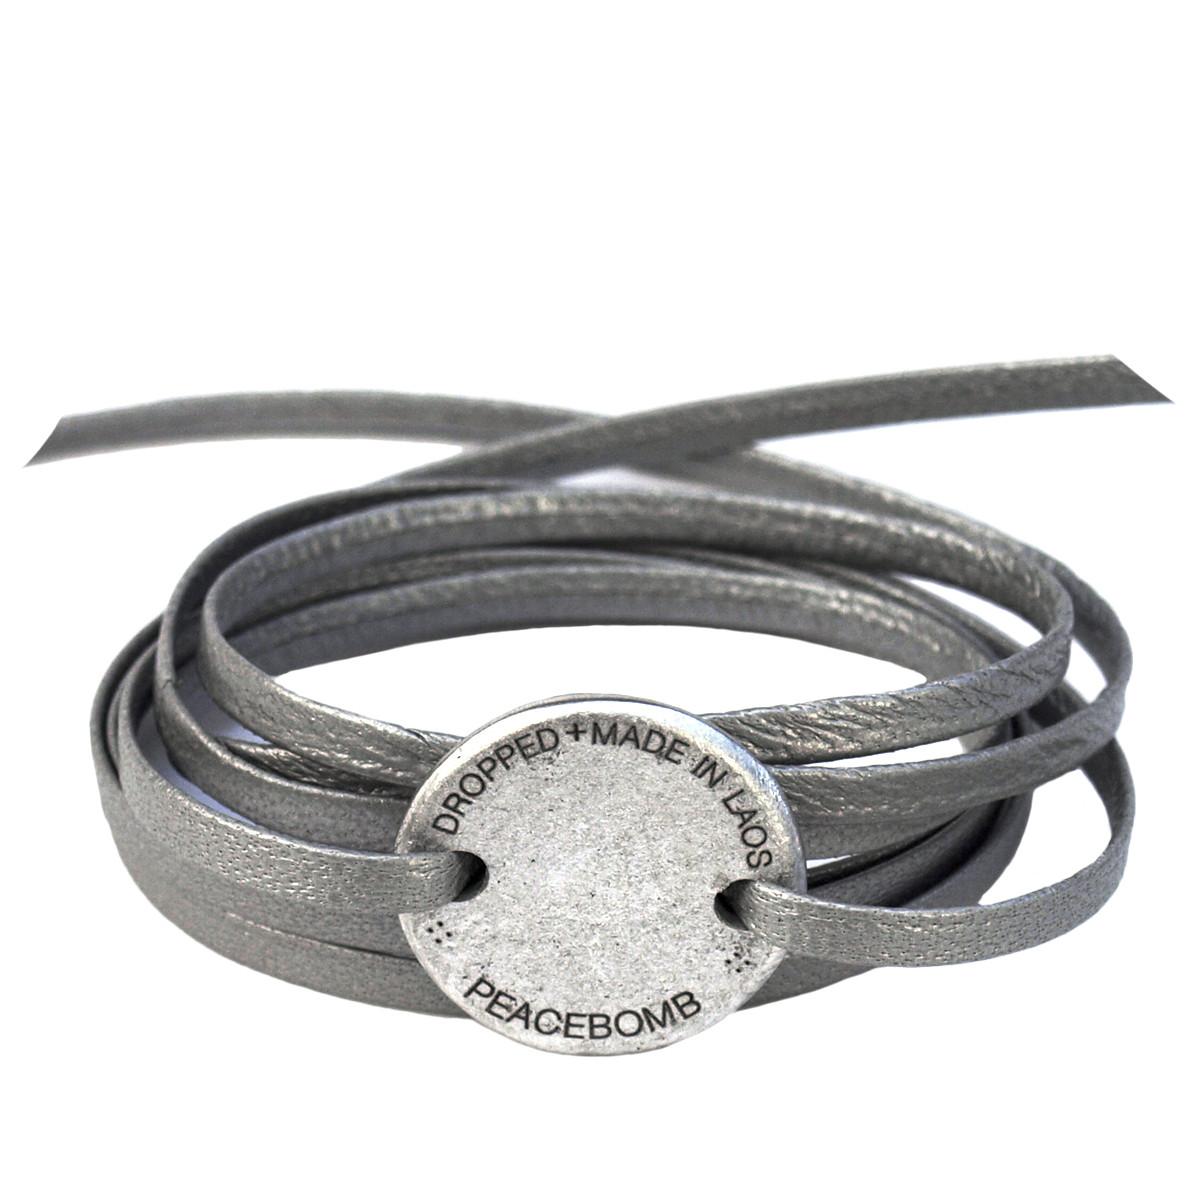 Article22. Läderarmband silver. Återvunnet.